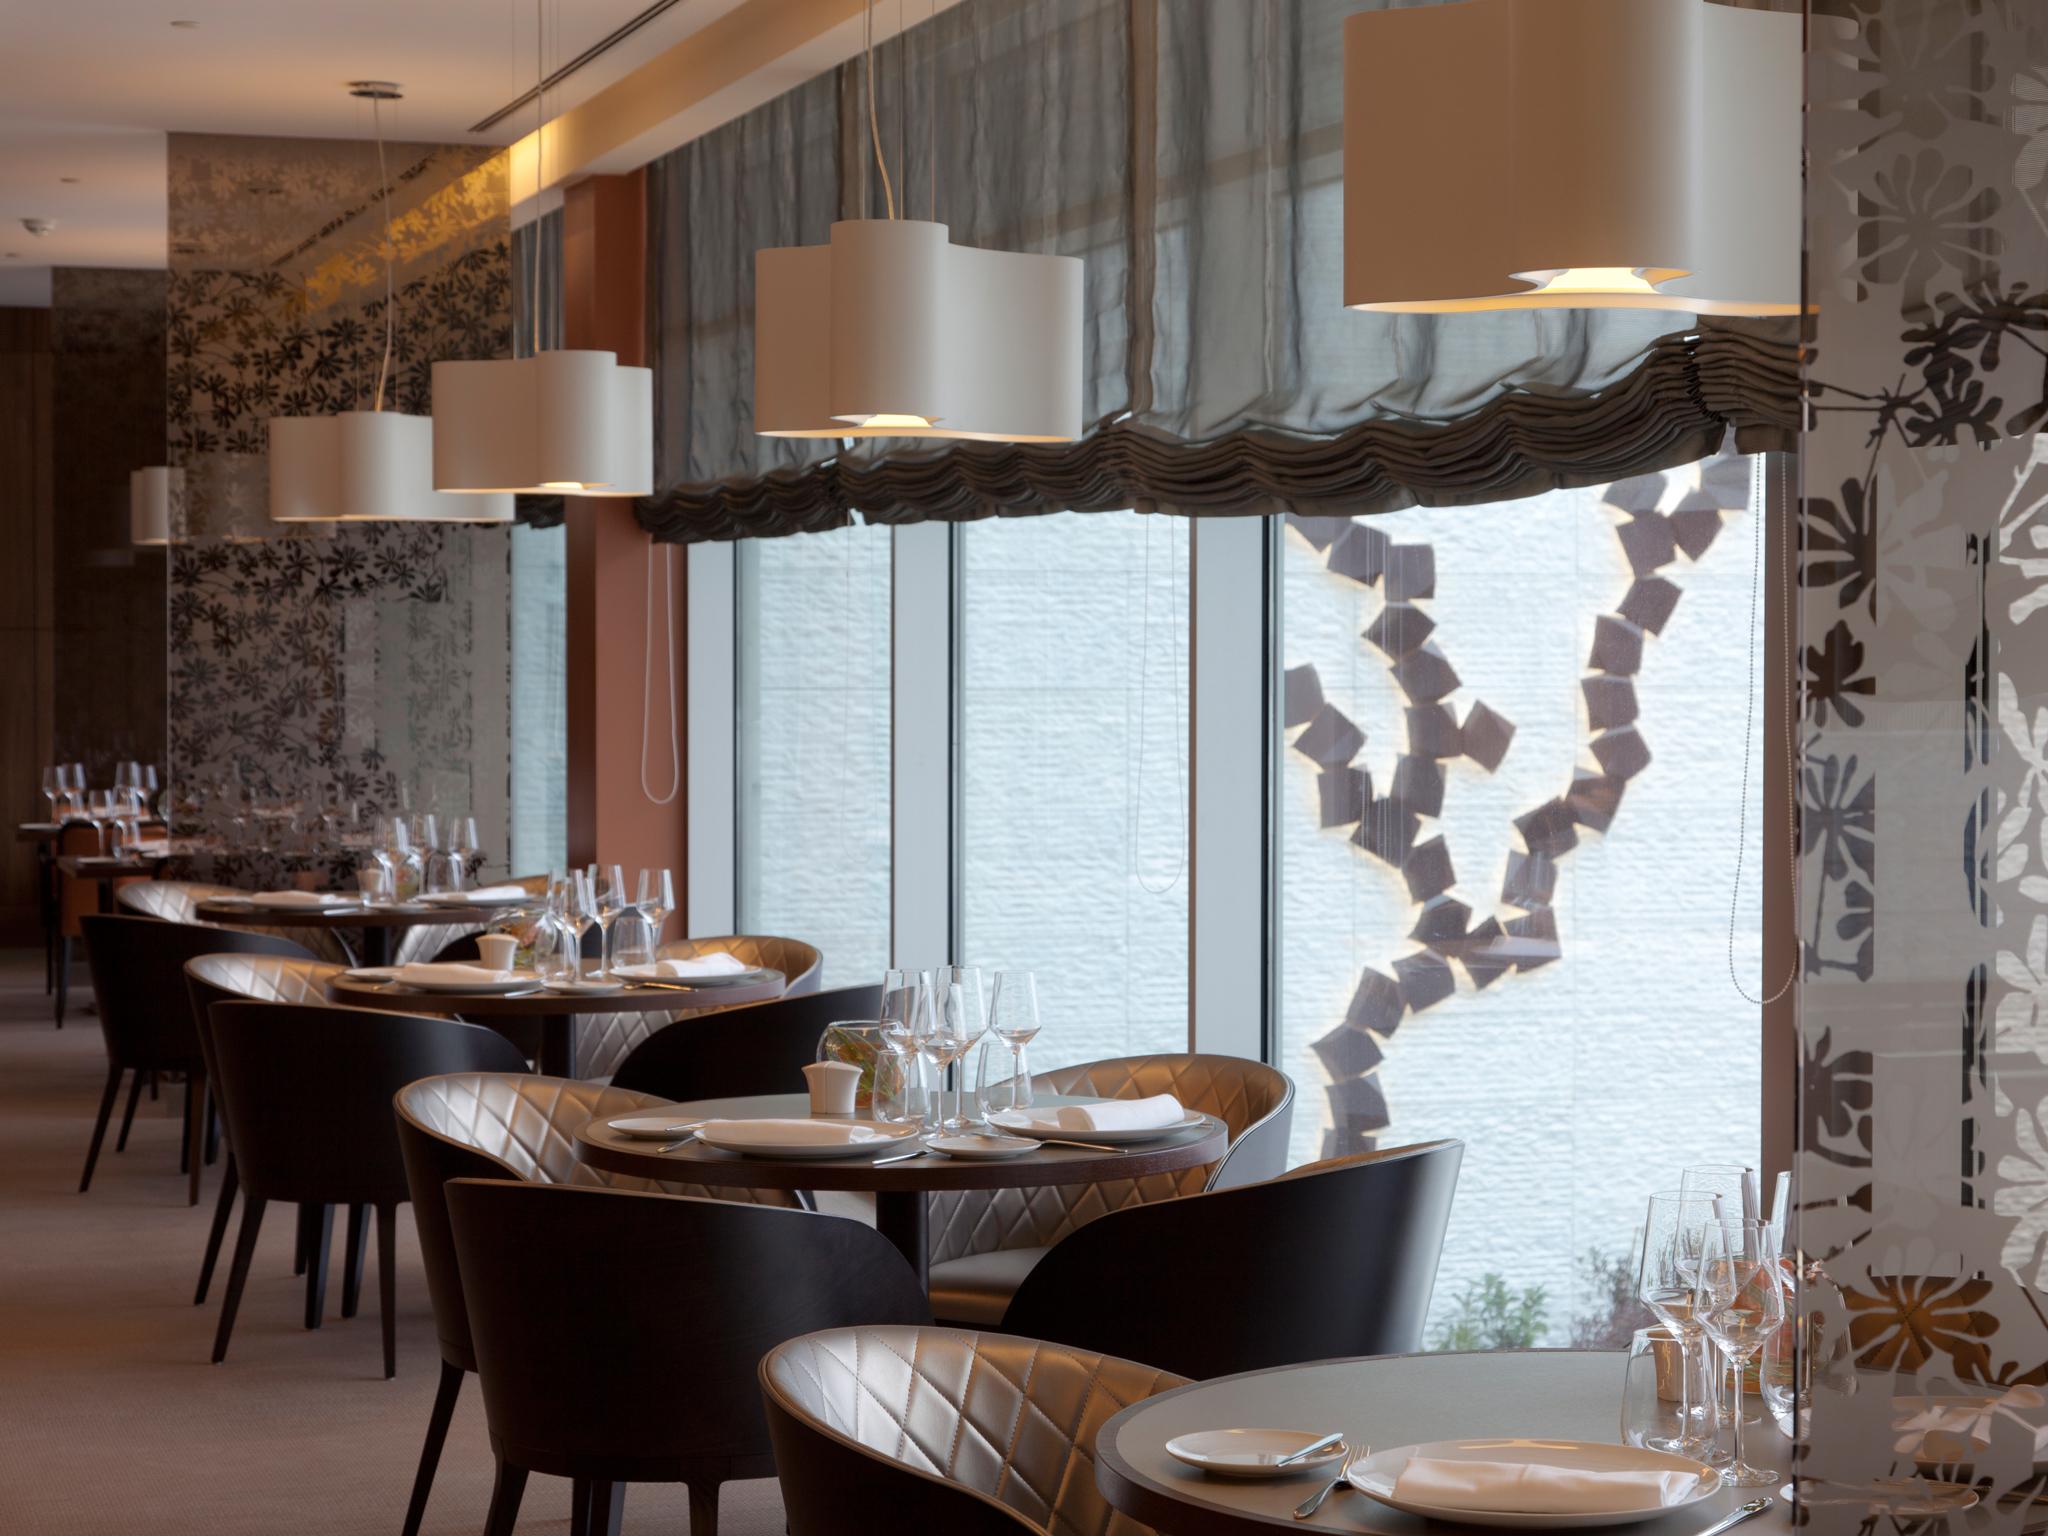 Epic Sana Lisboa - Restaurante Flor de Liz